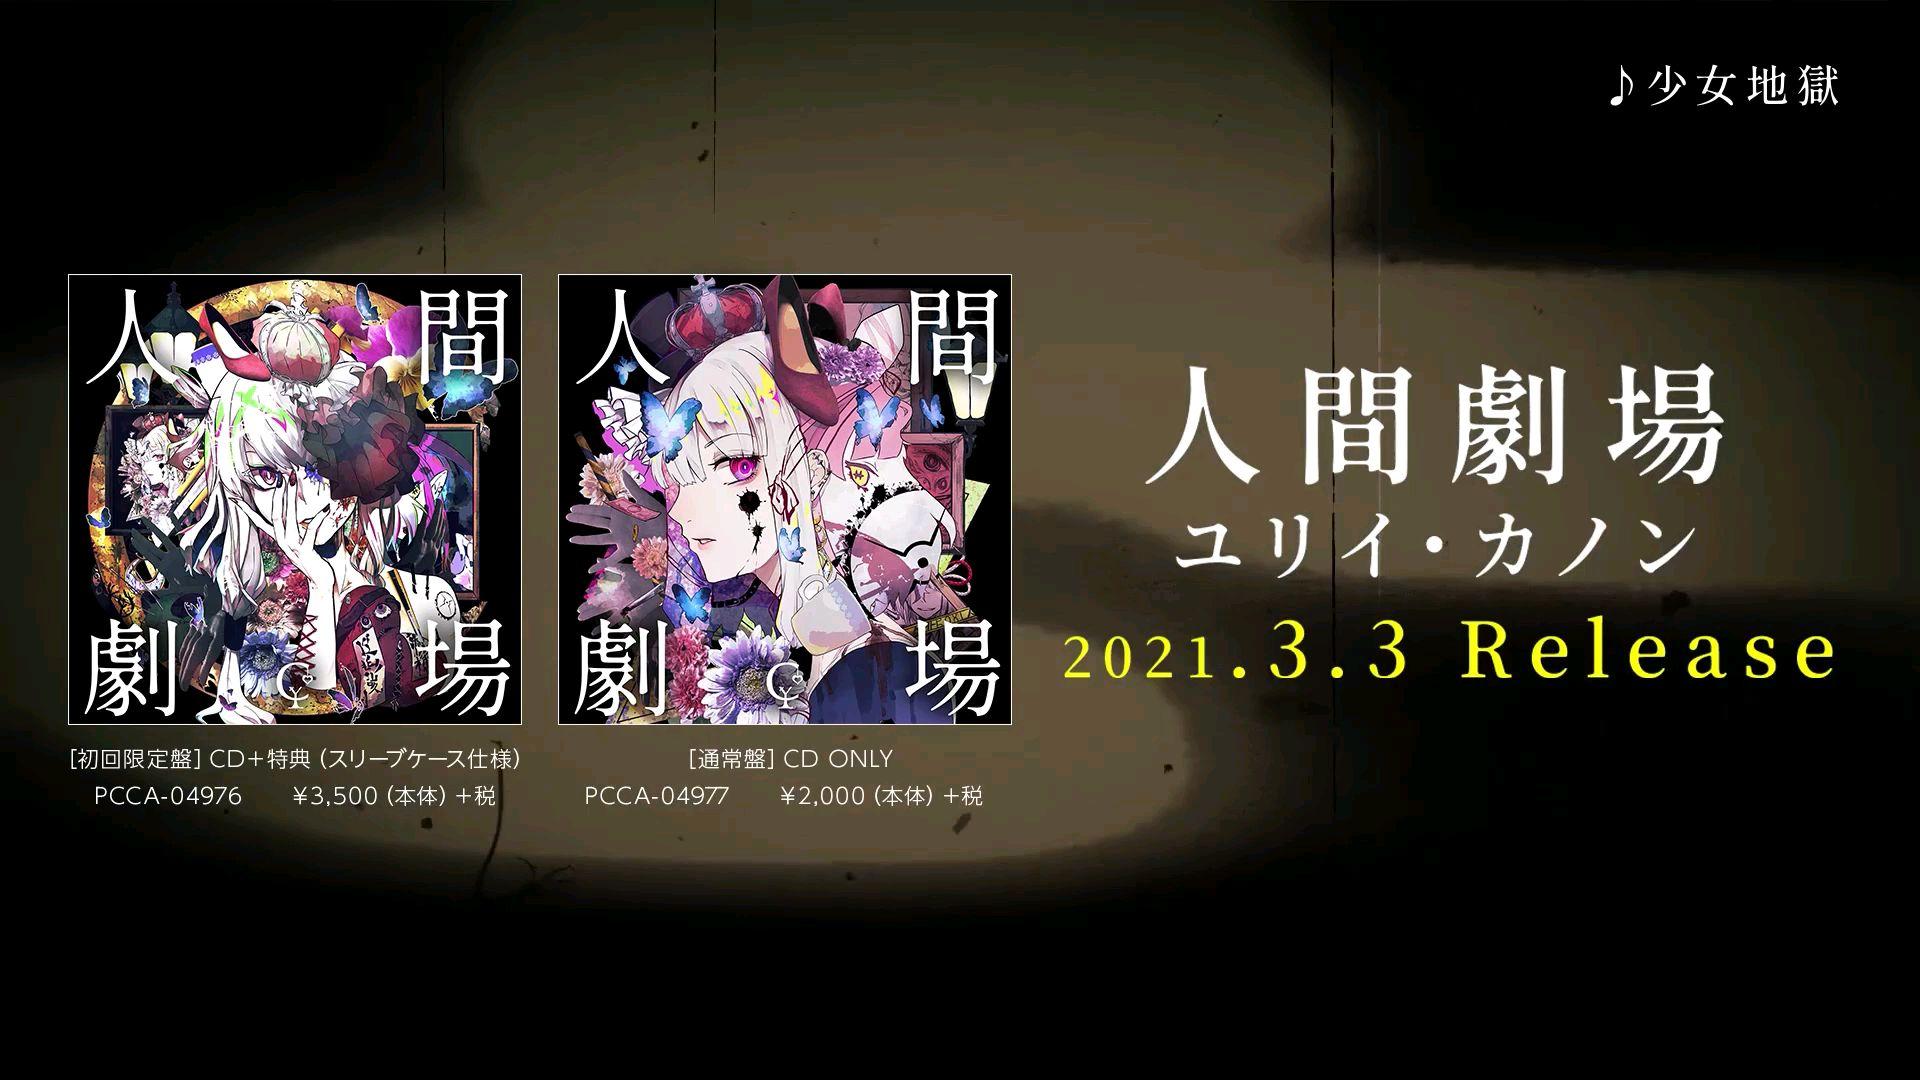 【XFD】人間劇場 / ユリイ・カノン